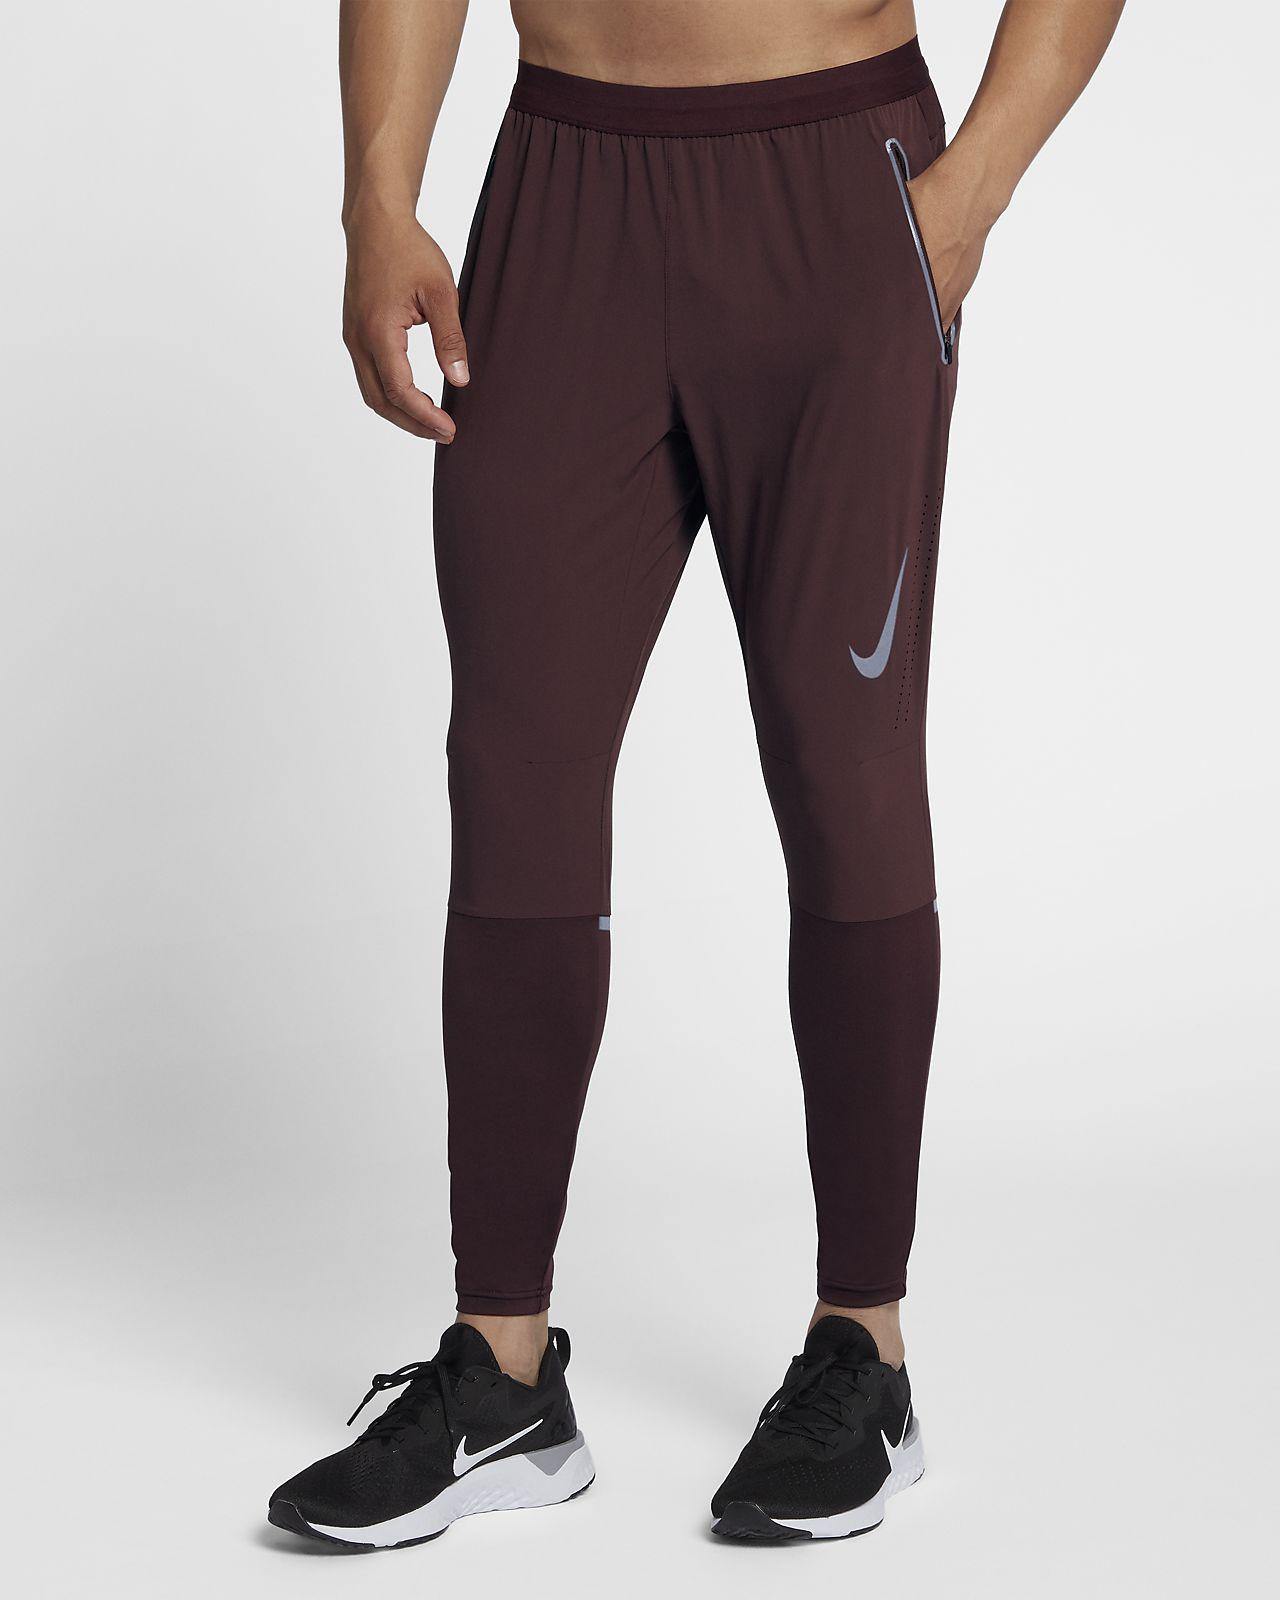 De Ch Running Pour Nike Pantalon Homme Swift SCxHd77wq